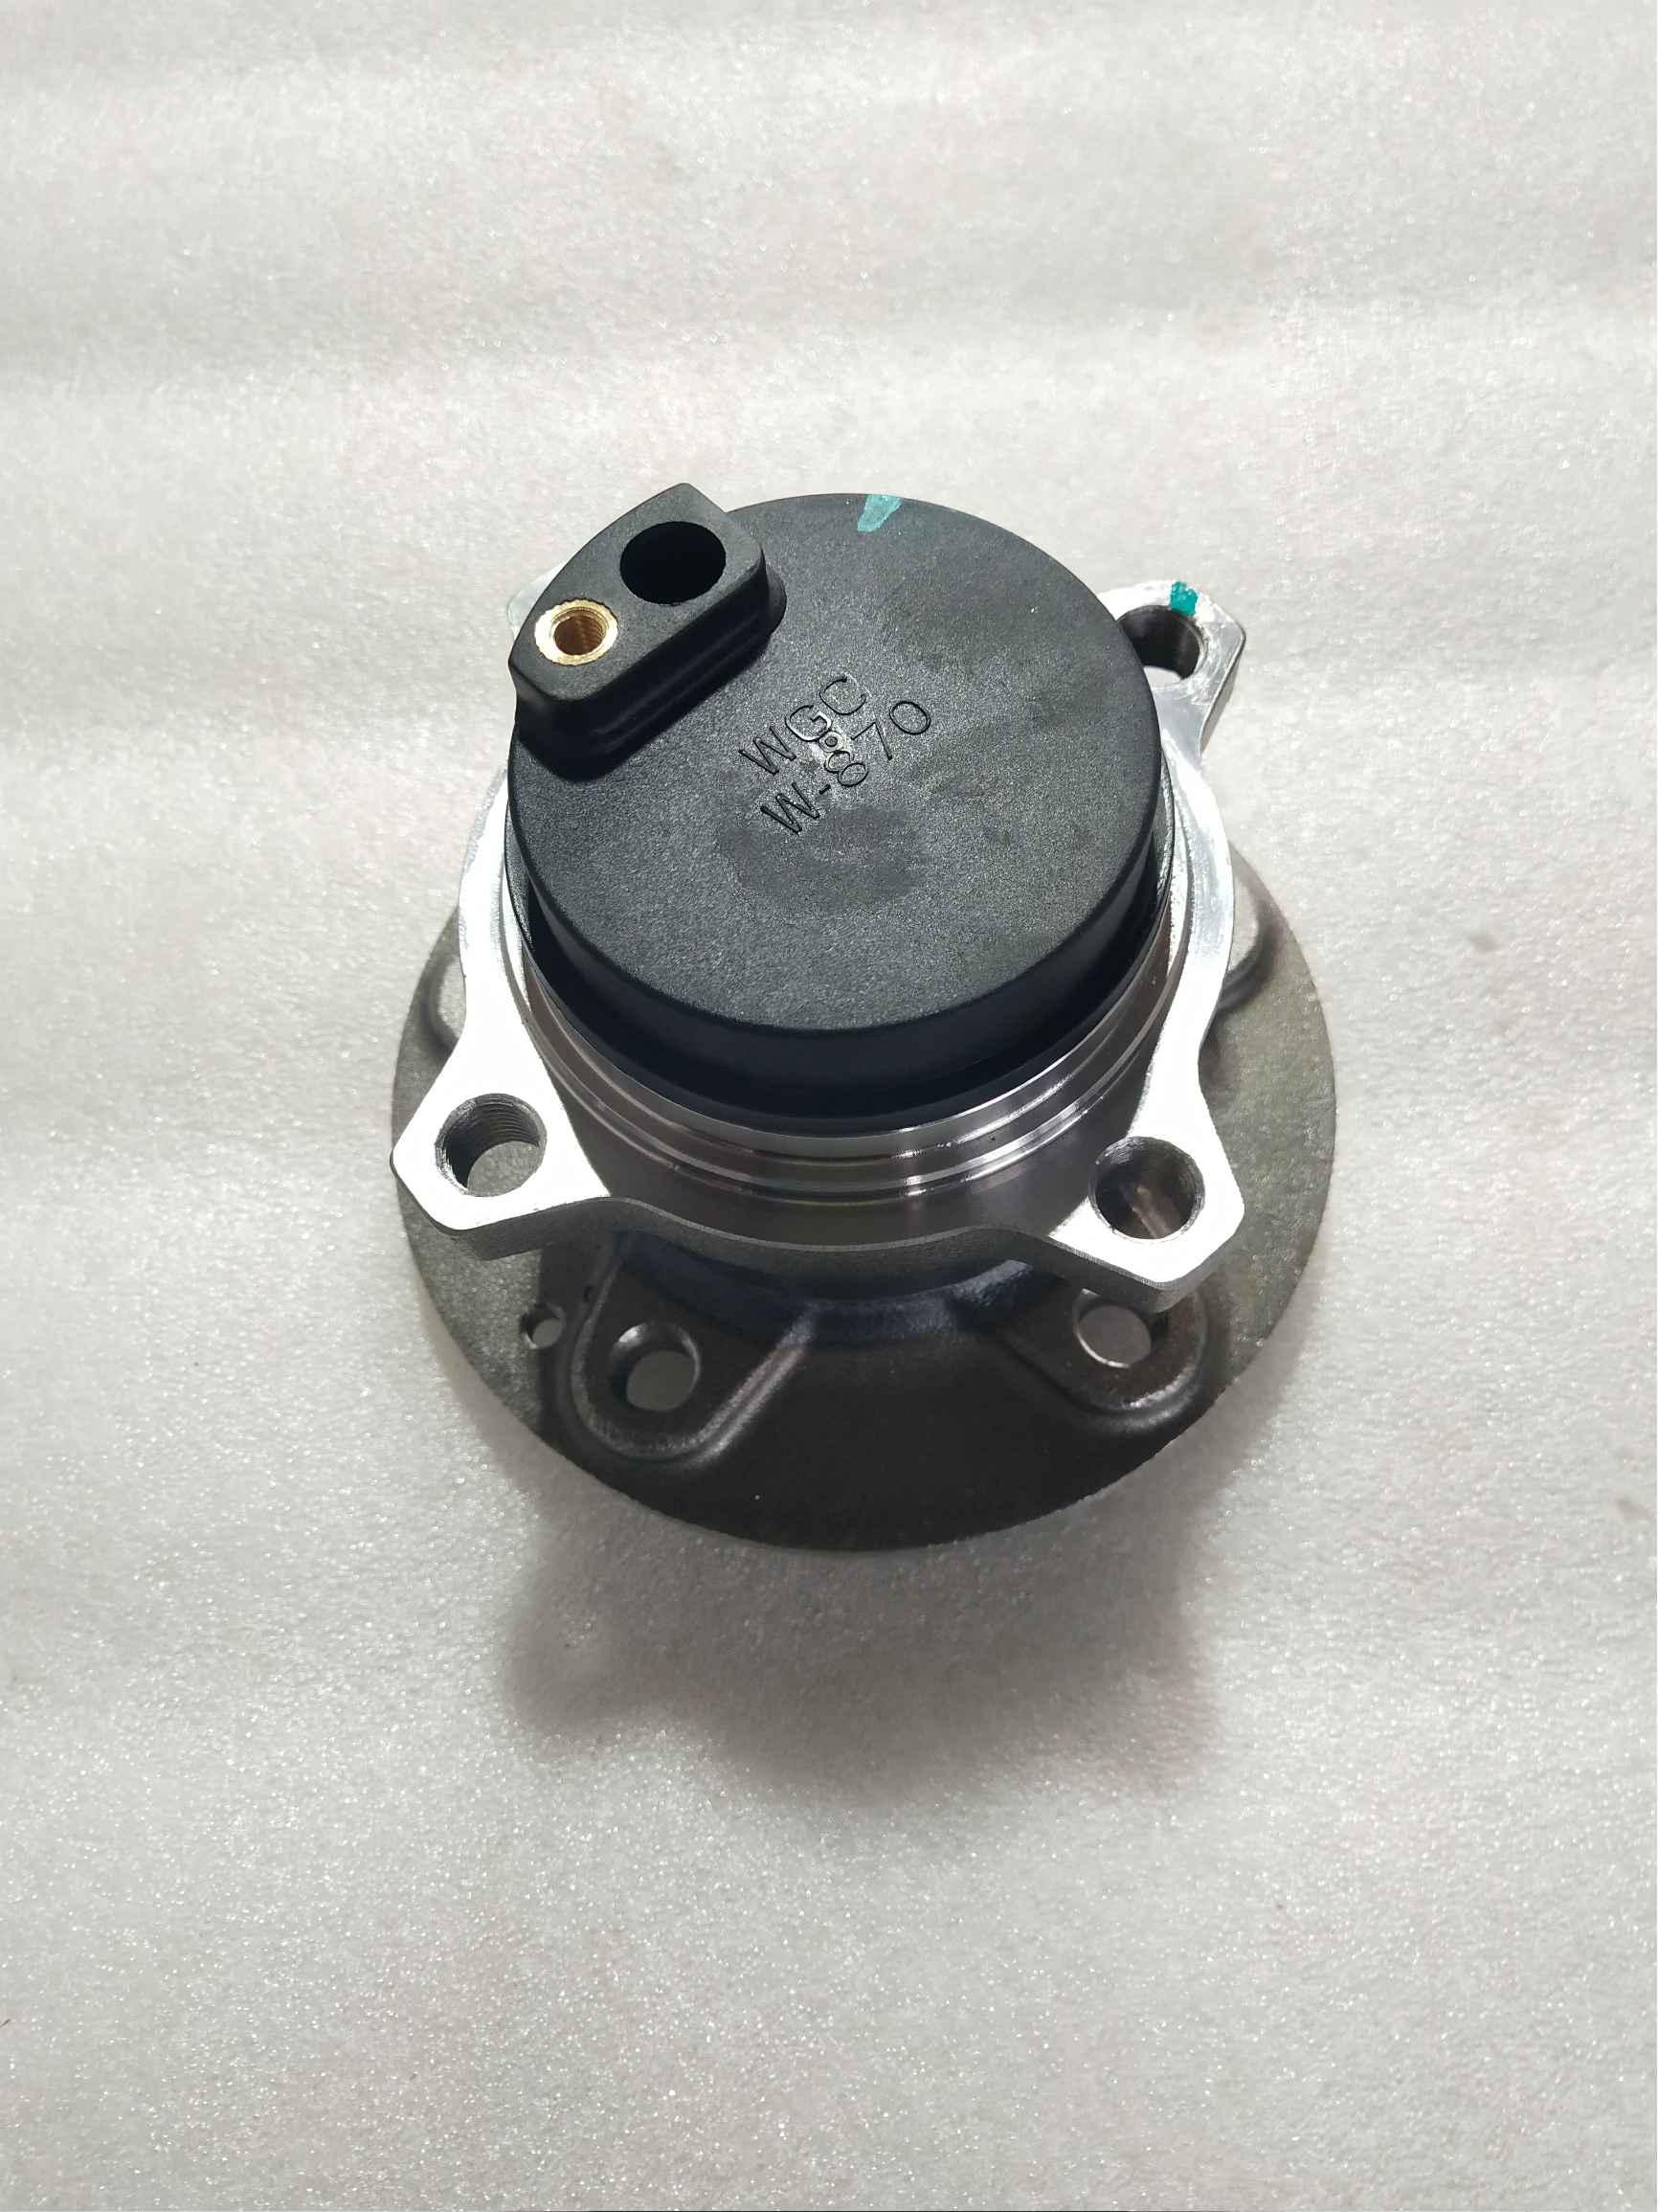 cheapest TPMS Car Tire Pressure Sensors HD Digital LCD Display Tire Pressure Alarm Monitoring System Auto Alarm USB or Solar Charging